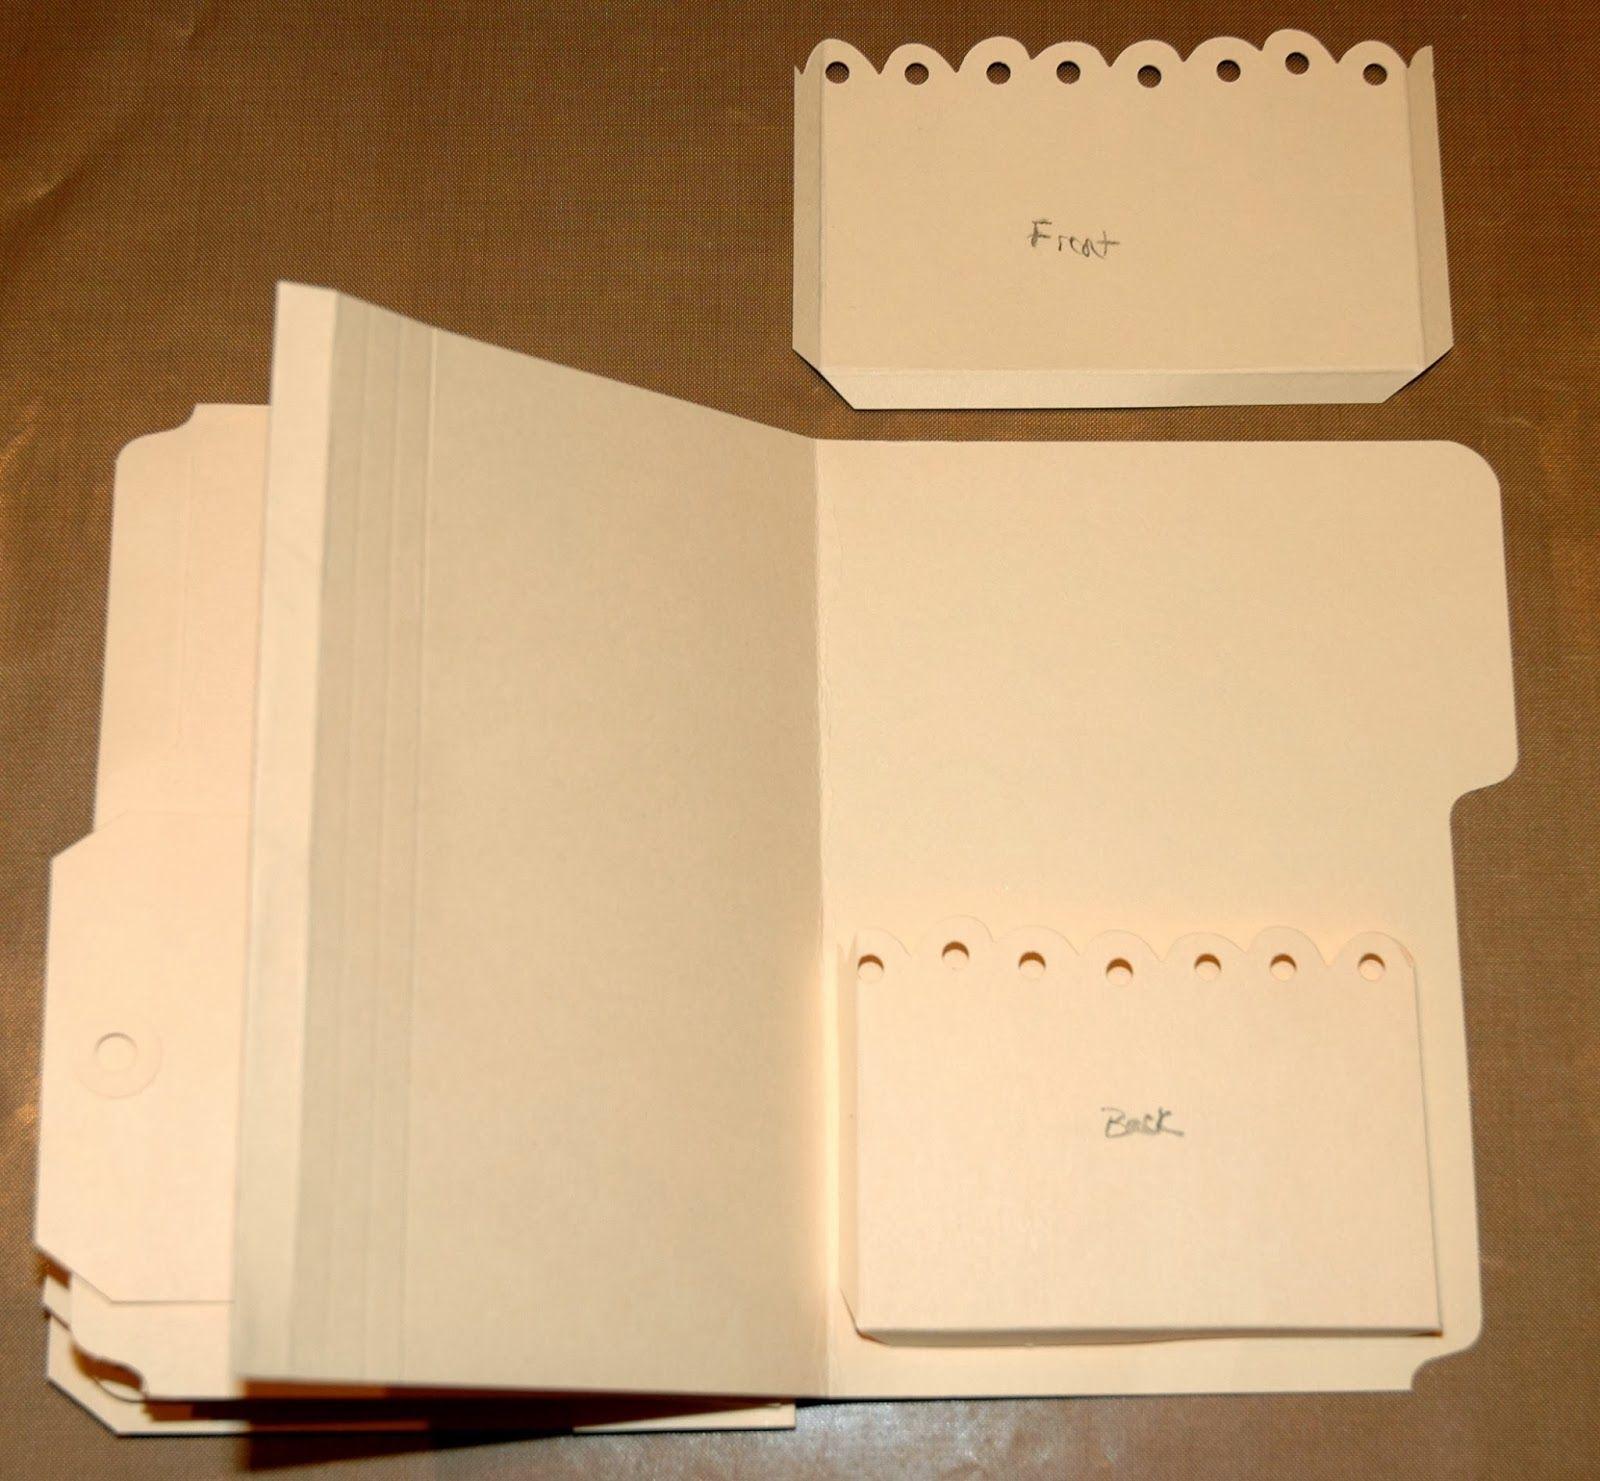 mini album from manilla folders ... genuis! CREATIVITY IS ...